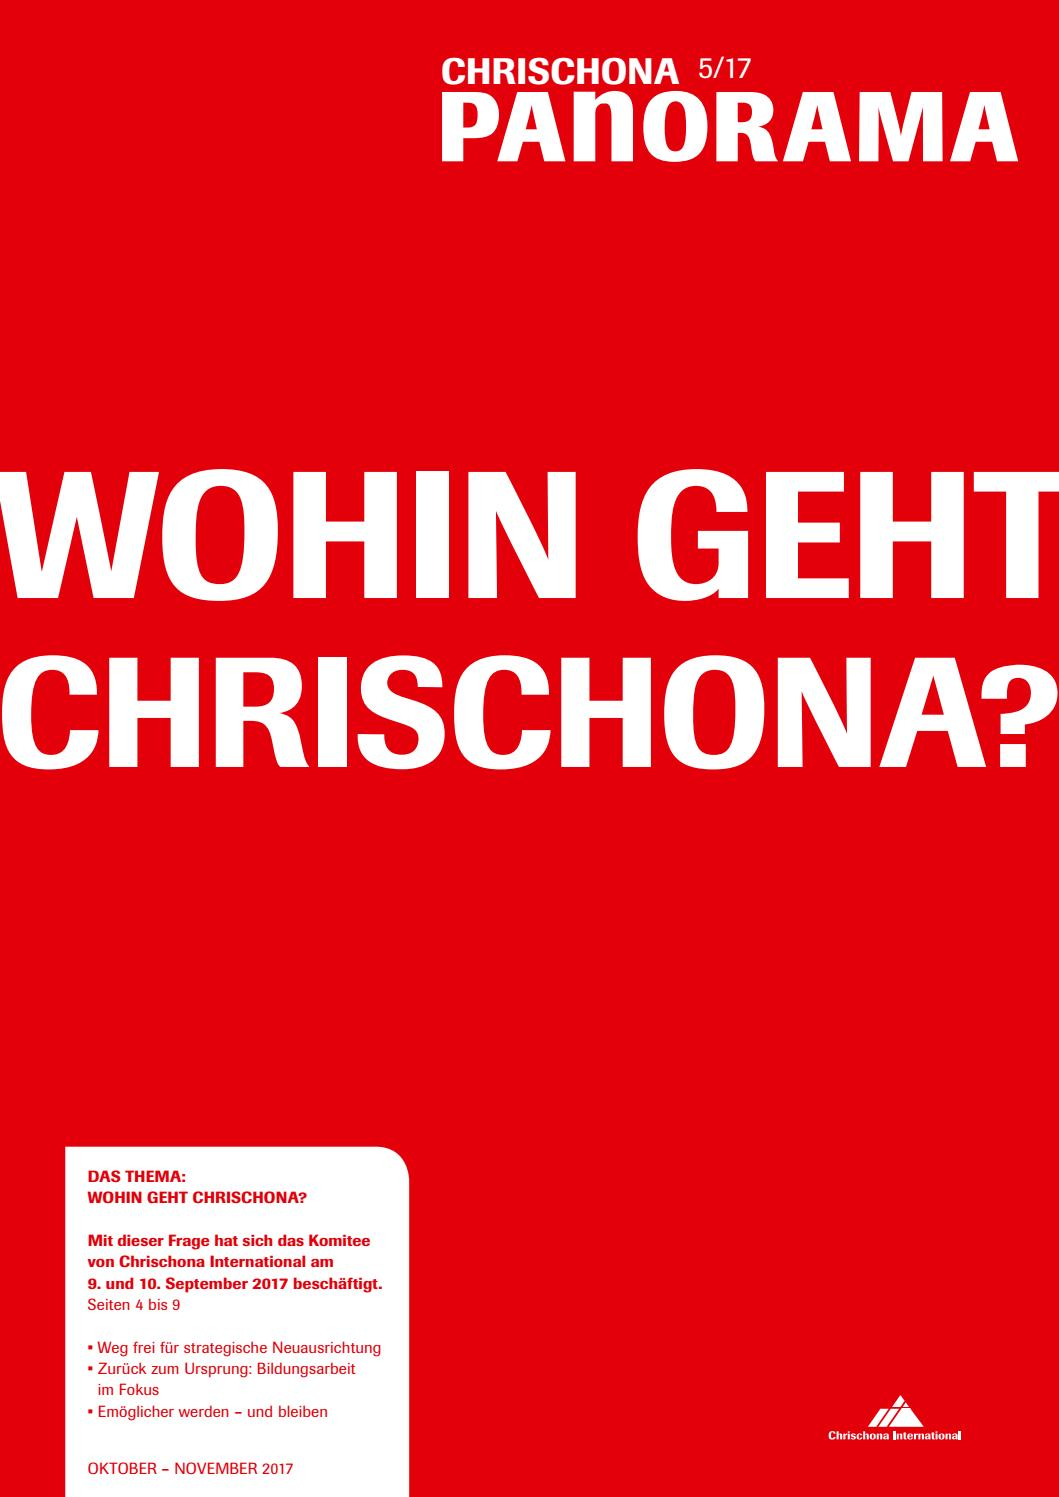 Chrischona-Panorama 5/2017: Wohin geht Chrischona? by Theologisches ...